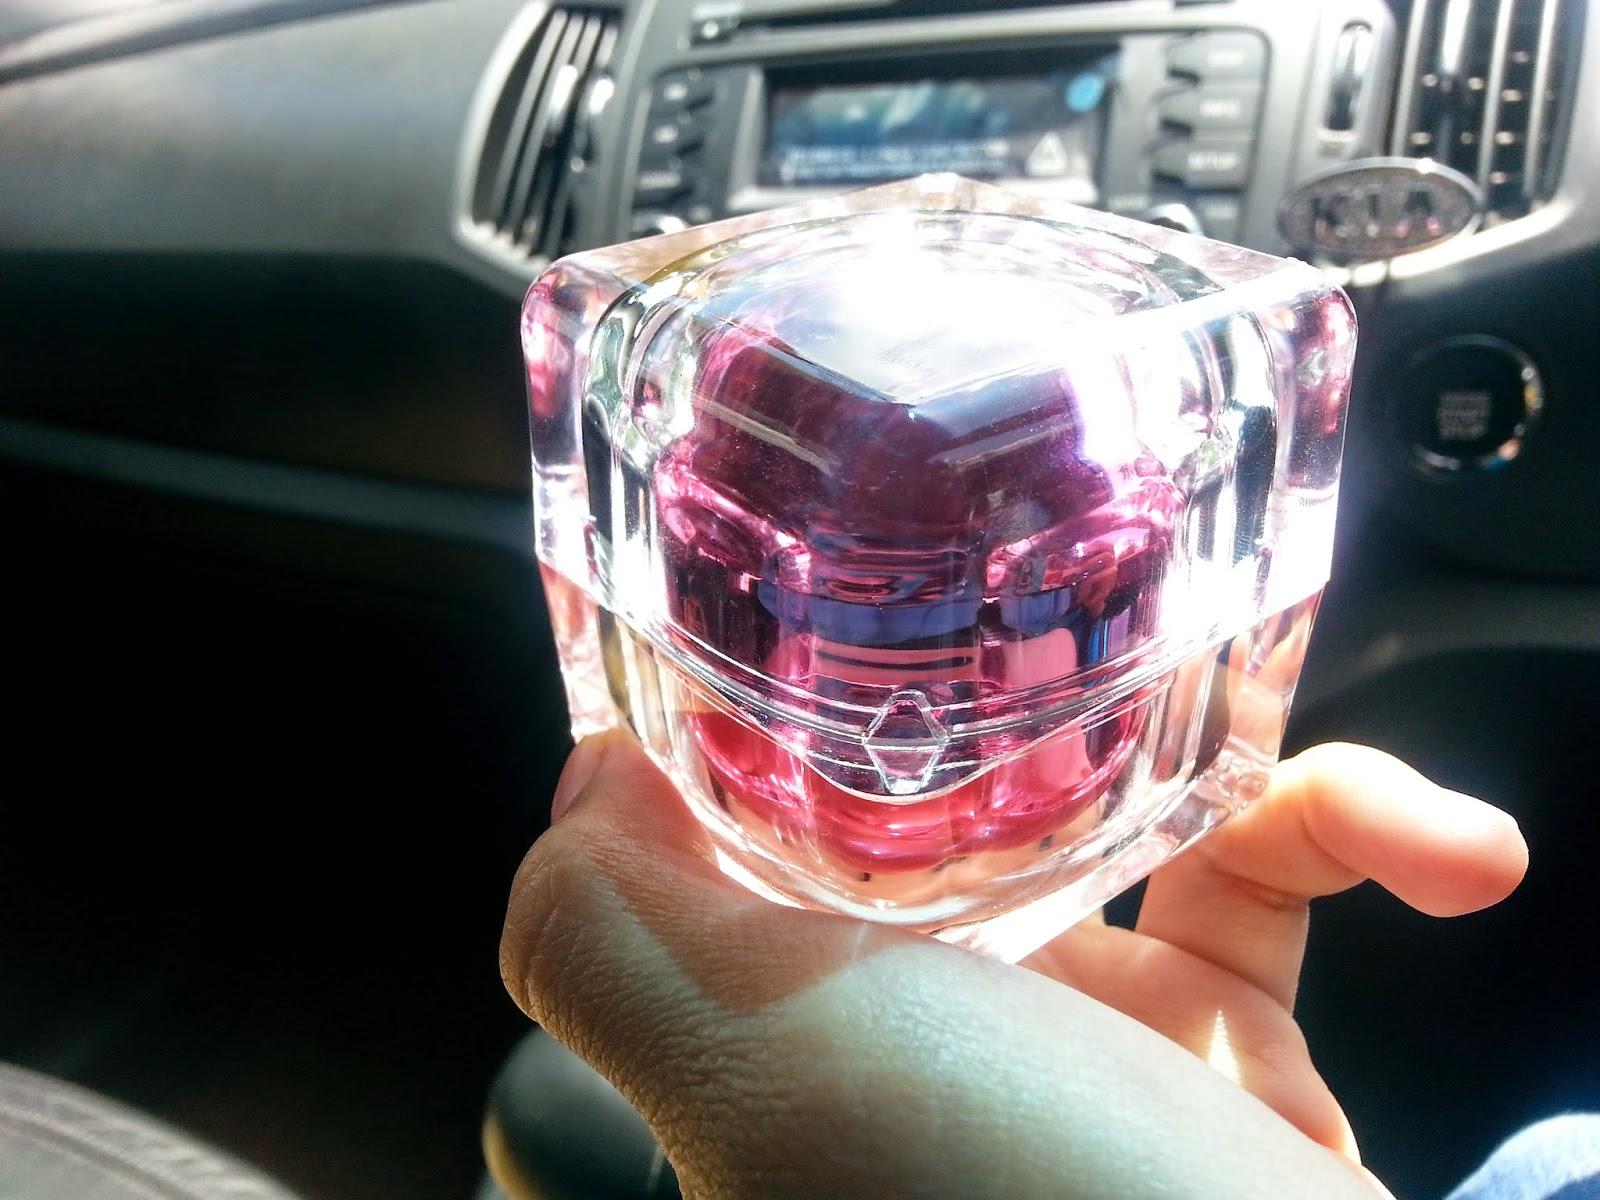 Inspiredfafabeauty Nenhong Pinky Lips Gel Original Pemerah Bibir Asal Fafa Pon Kering N Gelaptapi Lpas Pakai Ni Hari2 Da X Pink Sentiasa Seriousss Bekas Die Lawa Taw Huhu